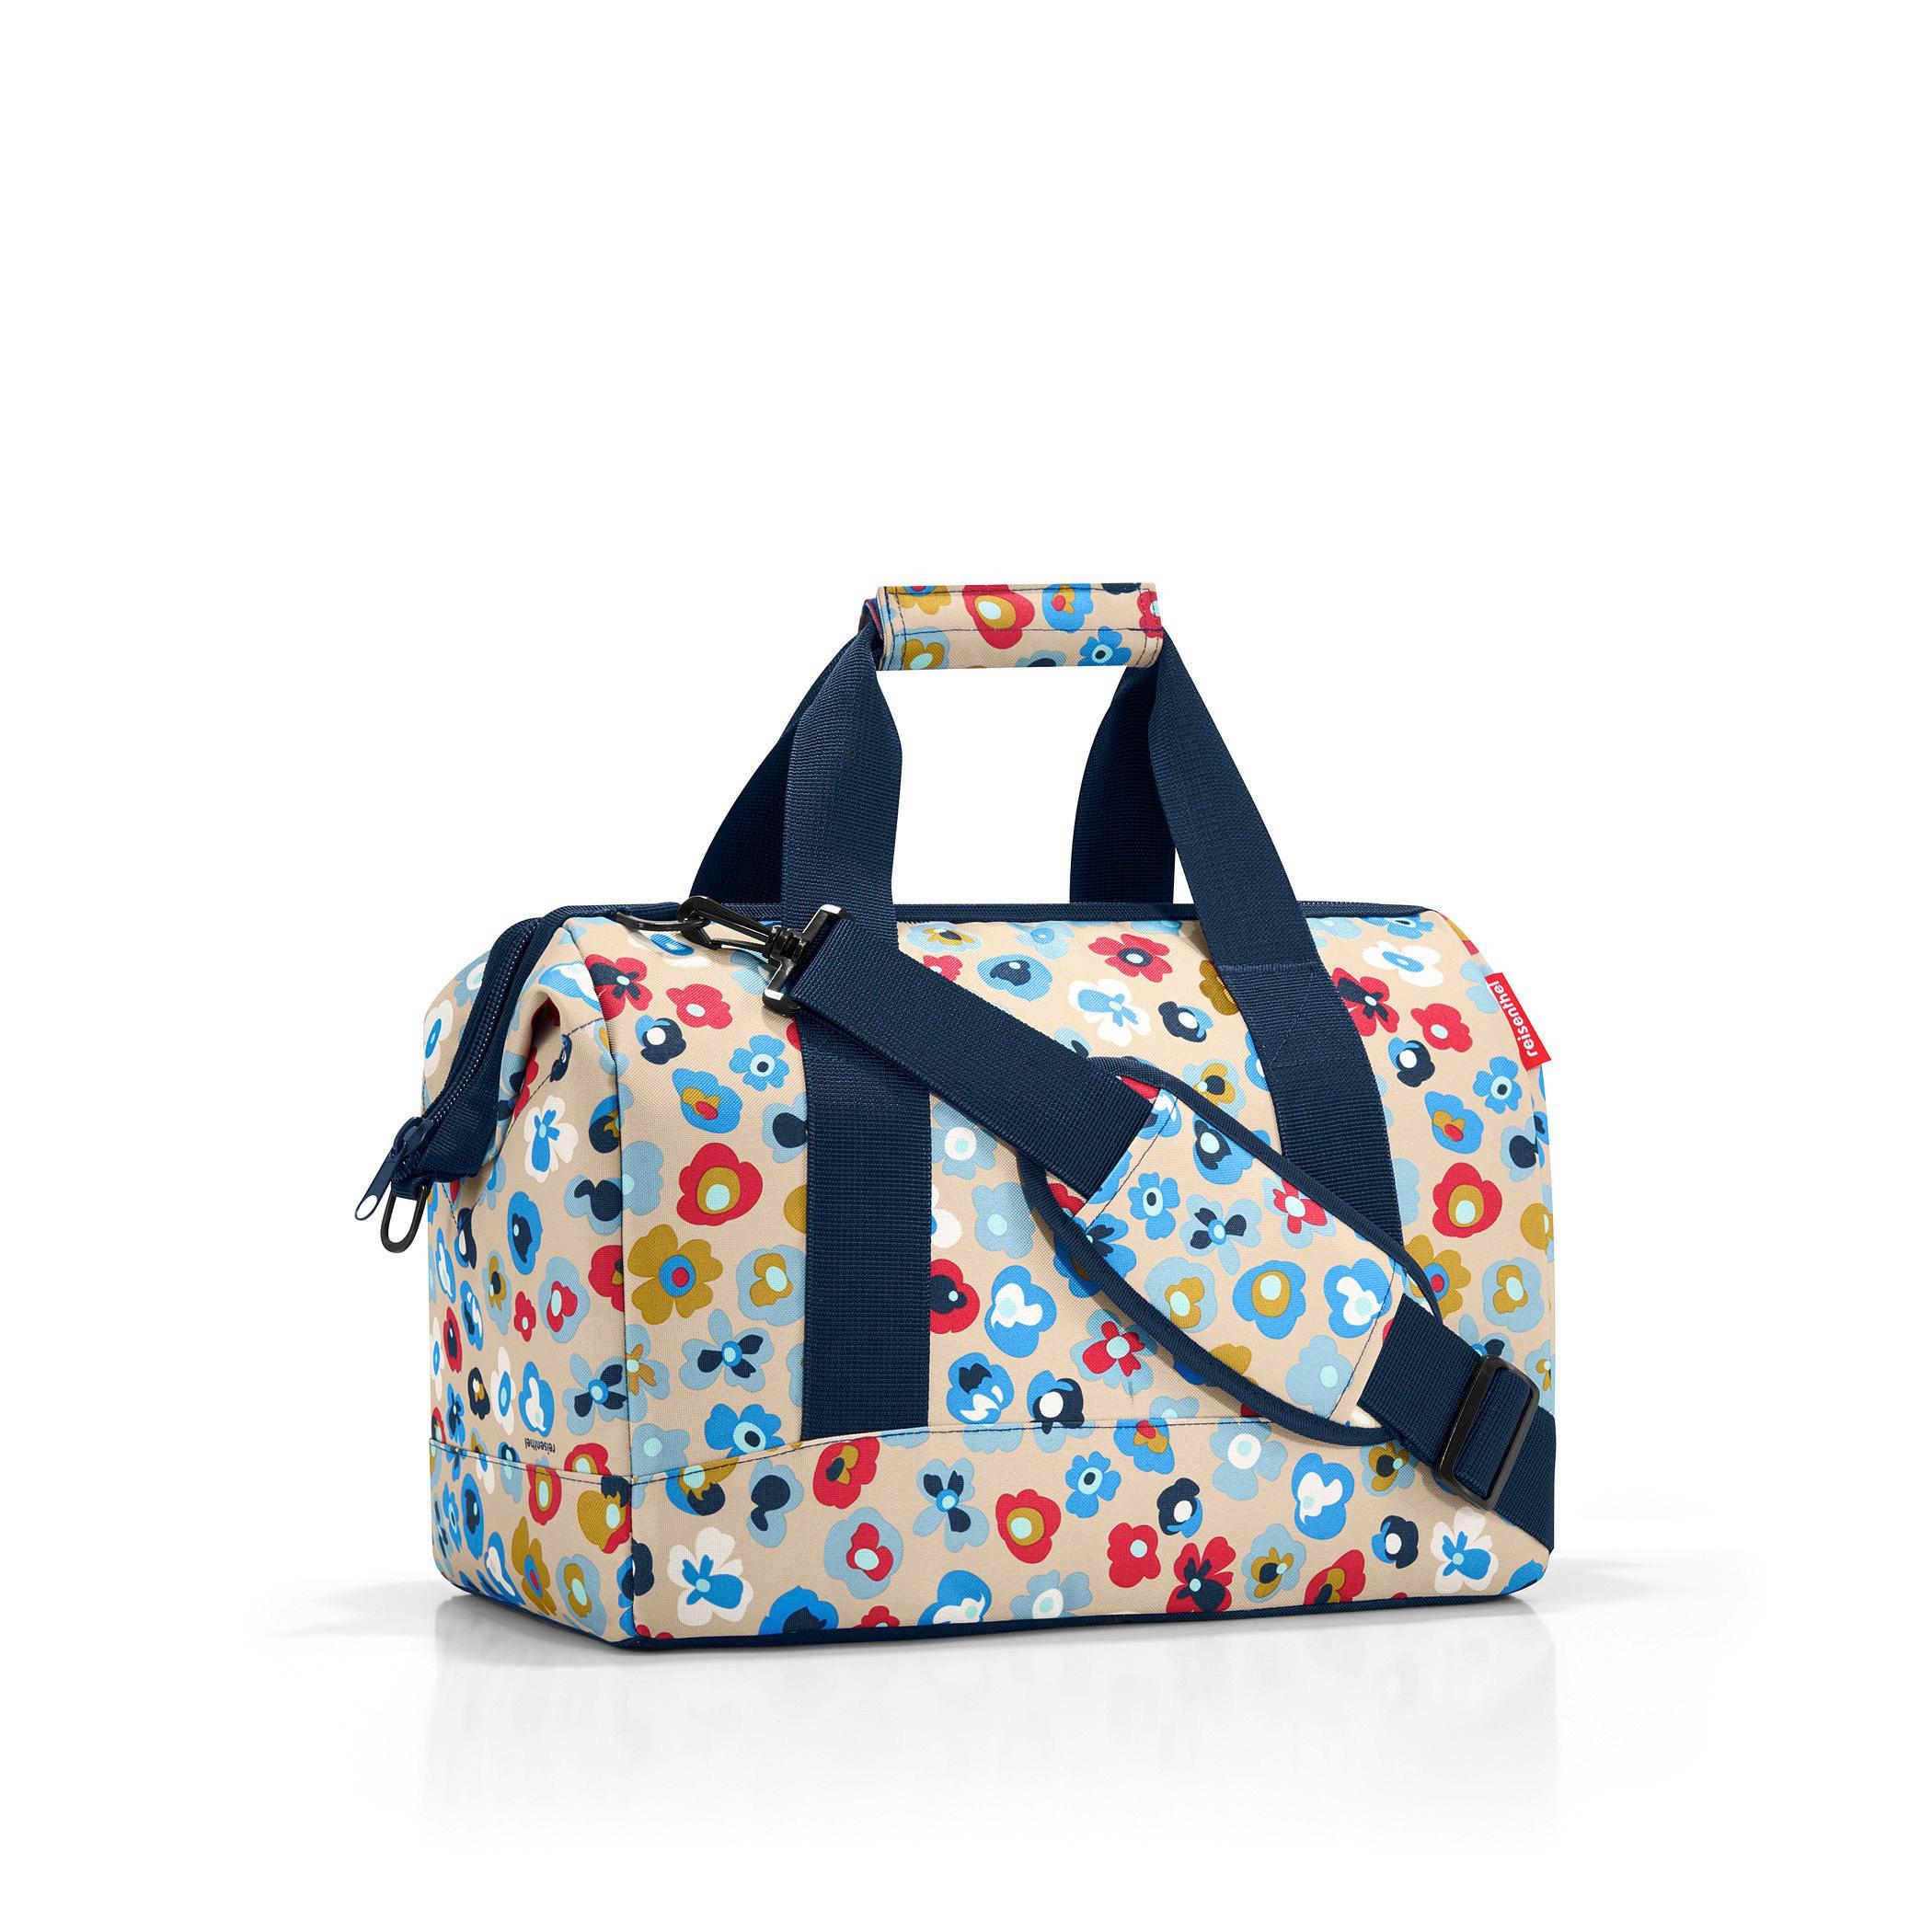 ALLROUNDER M MILLEFLEURS - Multicolor, Textil (40/33,5/24cm) - REISENTHEL